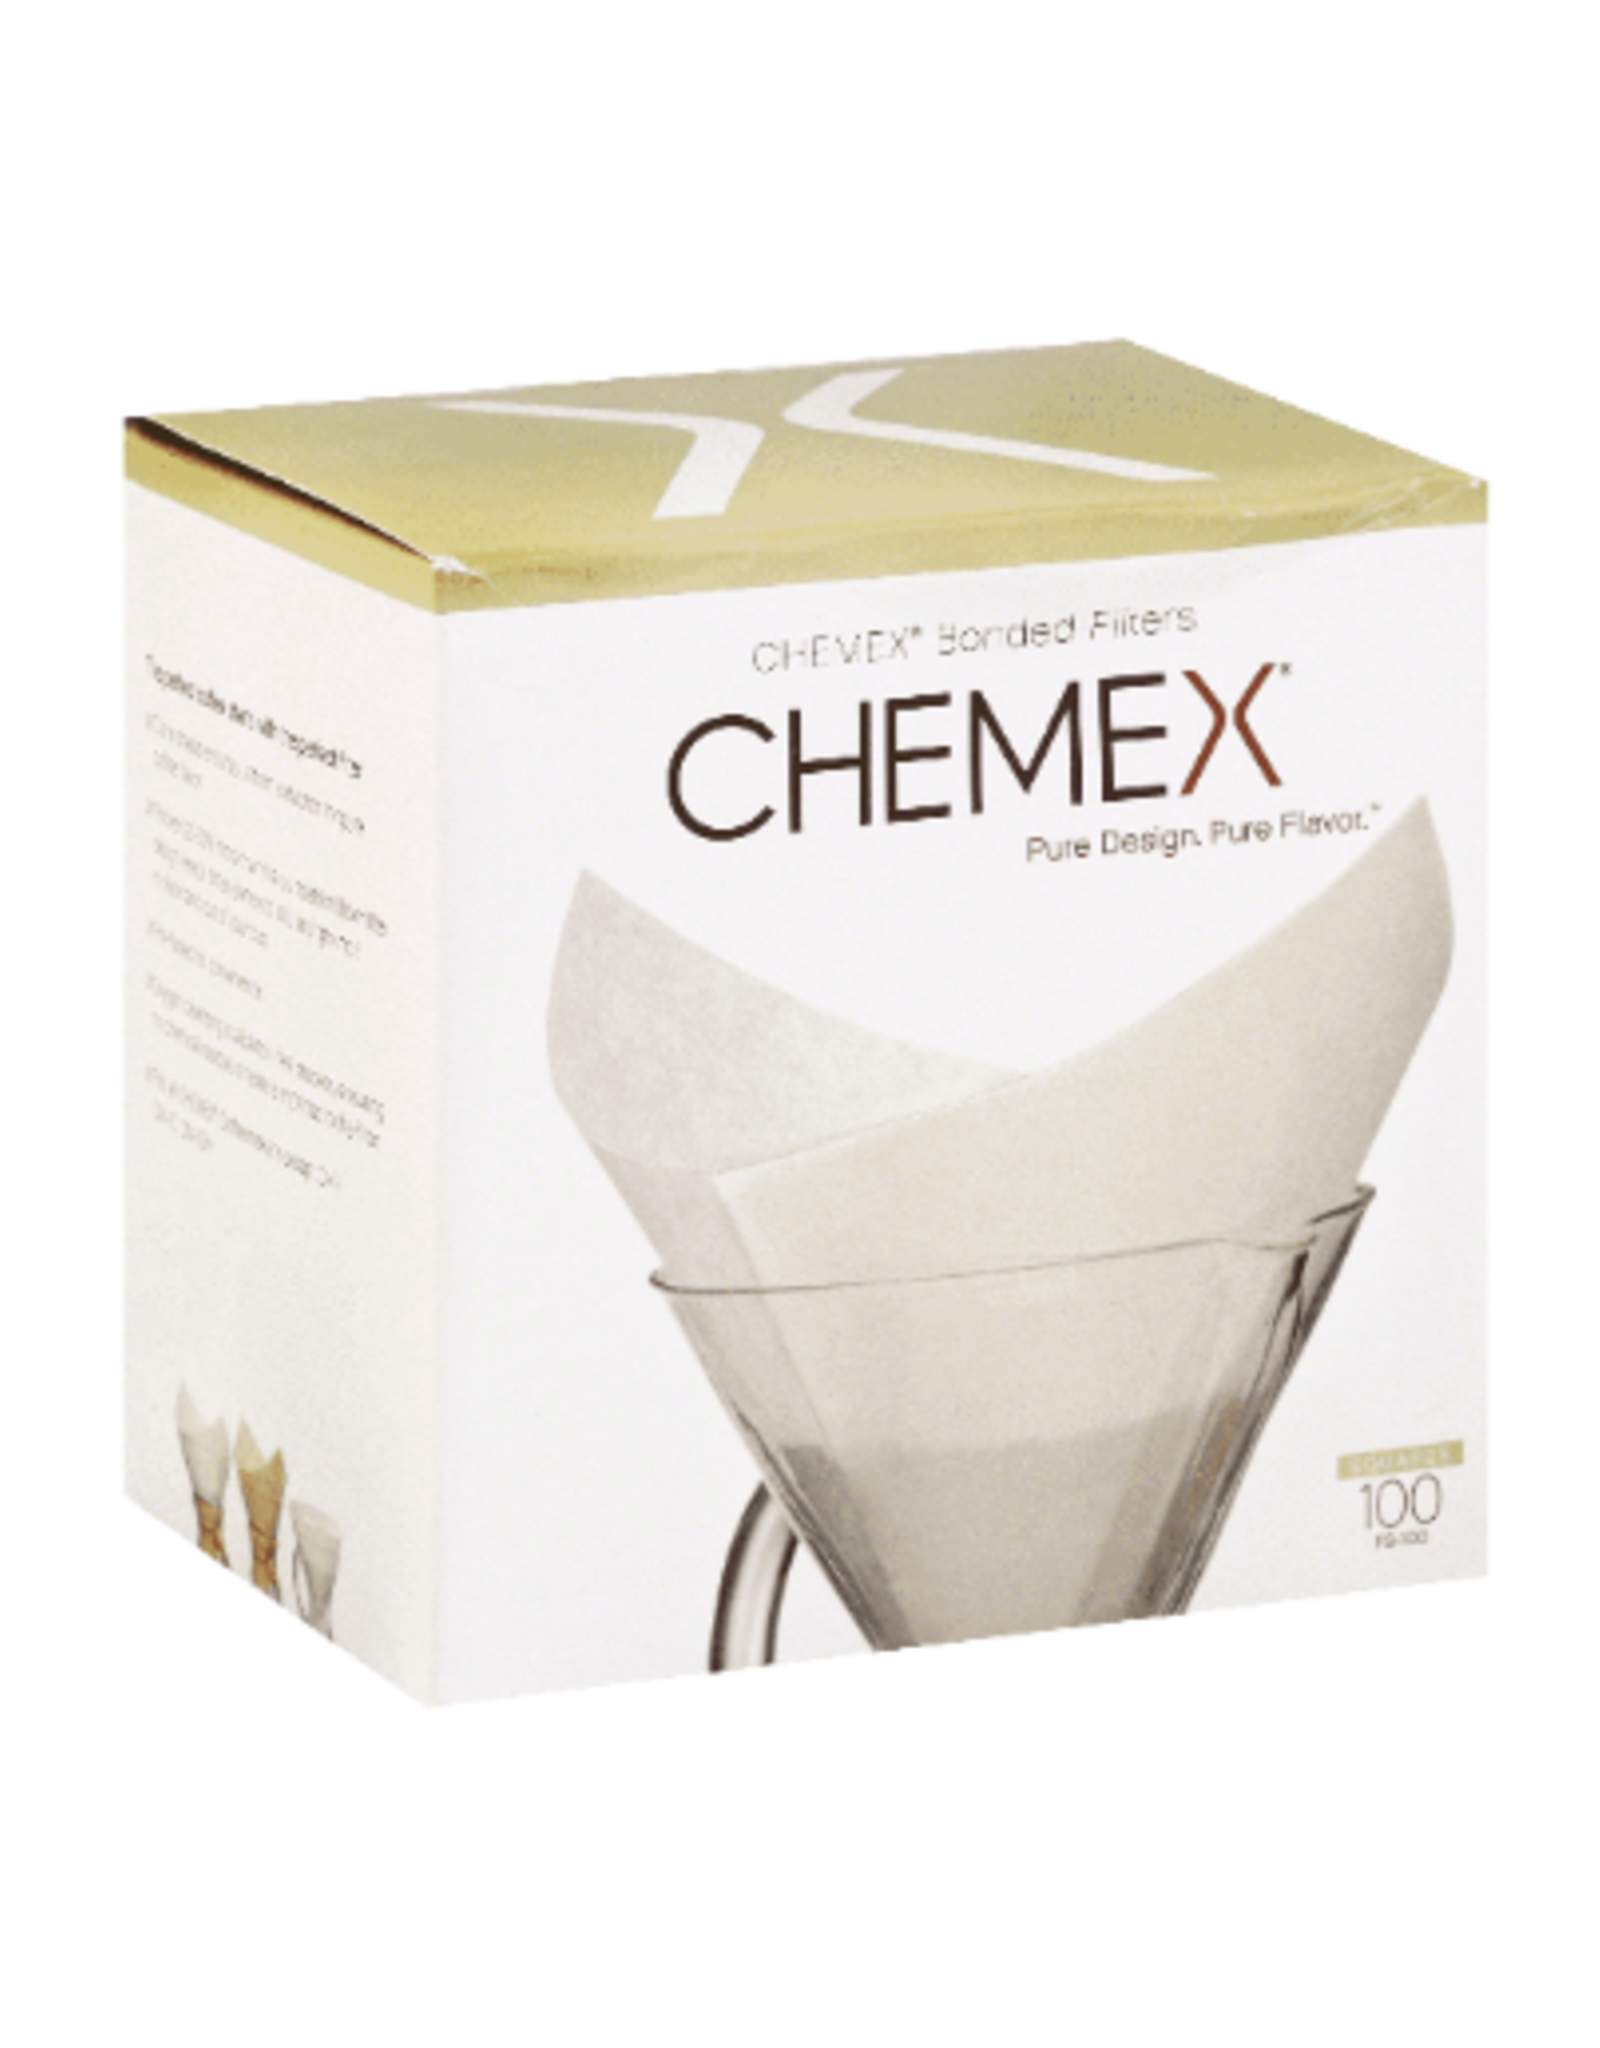 Chemex Chemex Prefolded Filter Squares